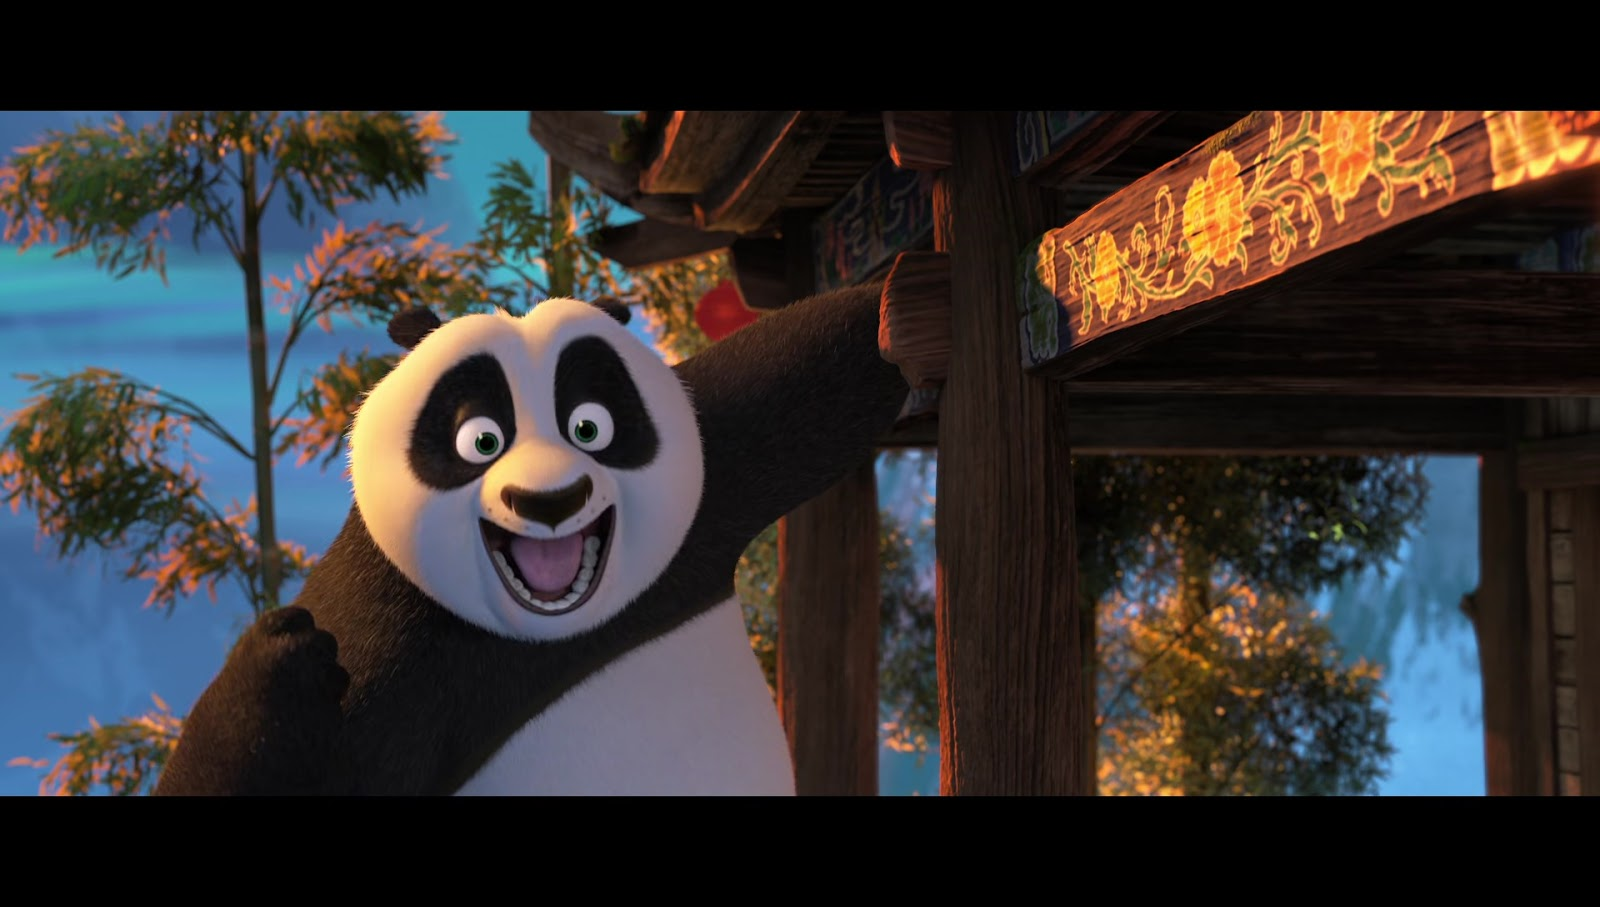 Captura de Kung Fu Panda 3 (2016) 1080p x265 HEVC Latino – Inglés